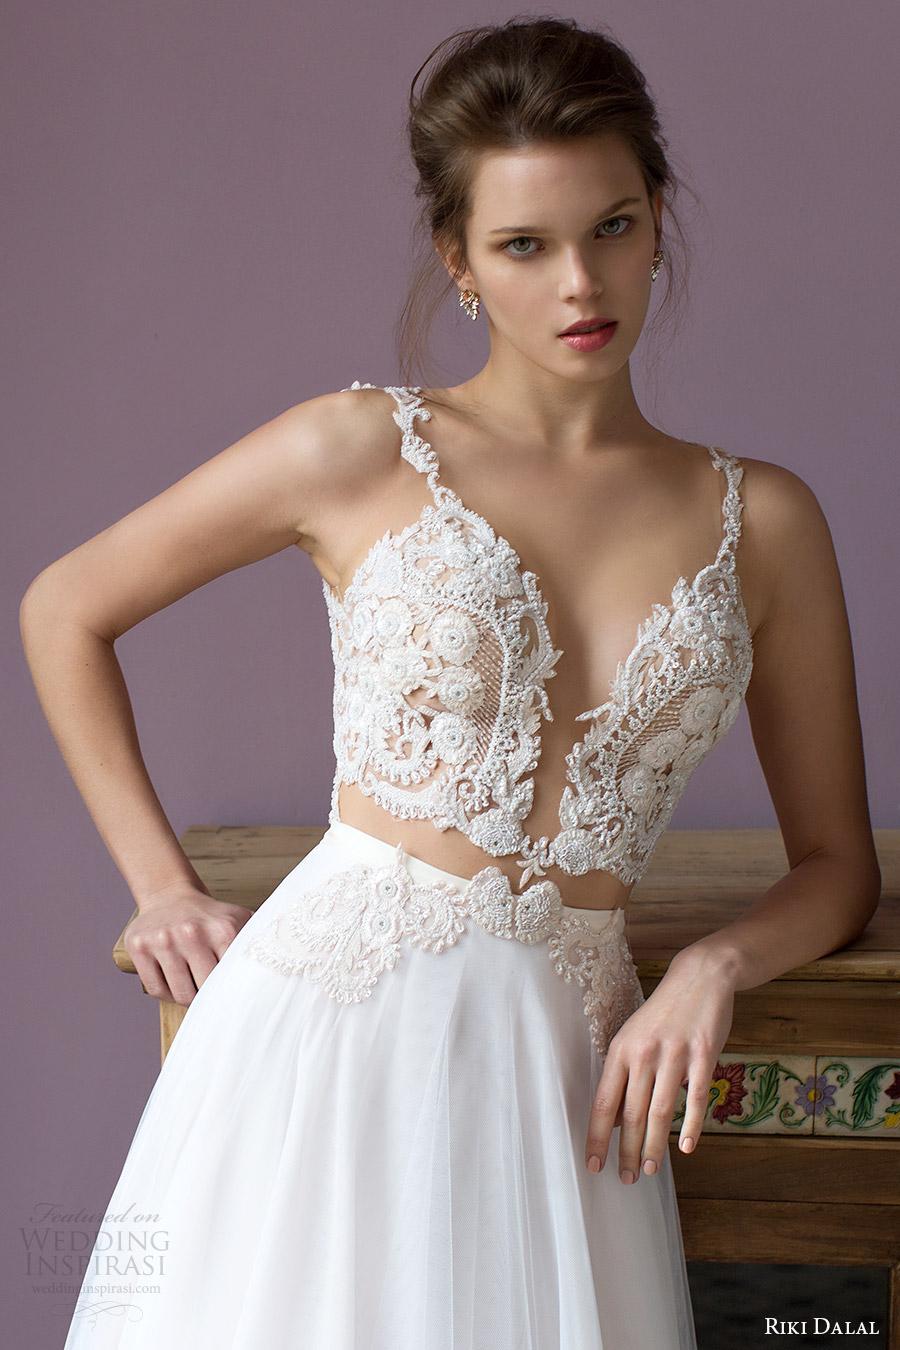 riki dalal bridal 2016 sleeveless plunging sweetheart lace bodice a line wedding dress (1805) zv sexy romantic